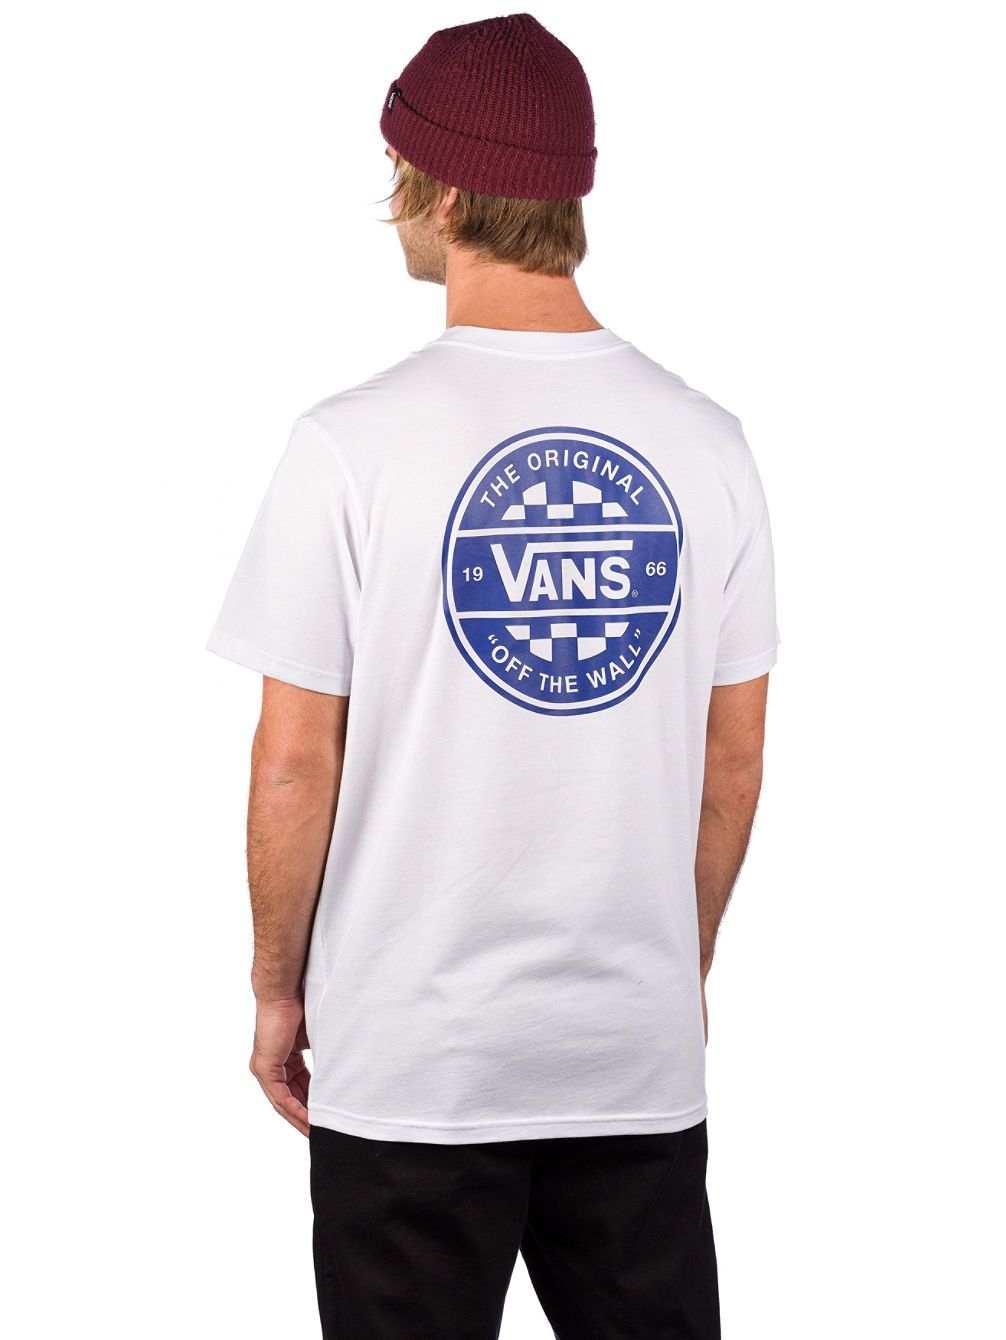 3498156ee32 Buy Vans Checker Co. T-Shirt online at blue-tomato.com